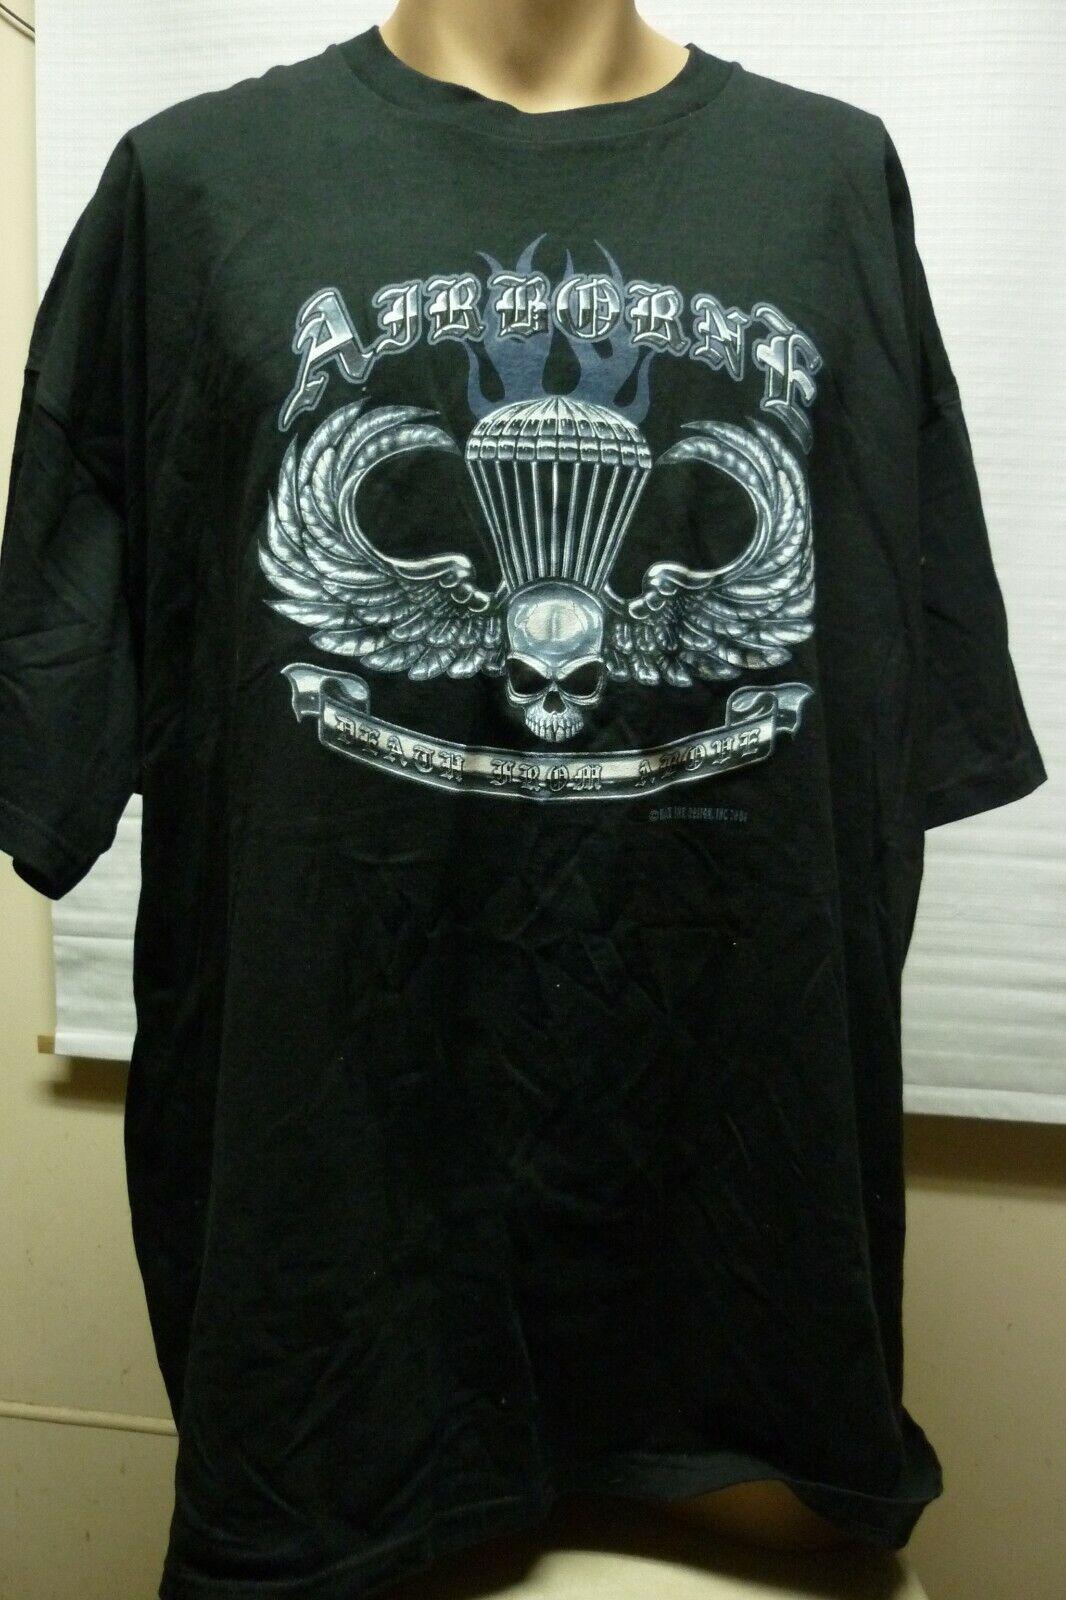 2004 VINTAGE T-SHIRT